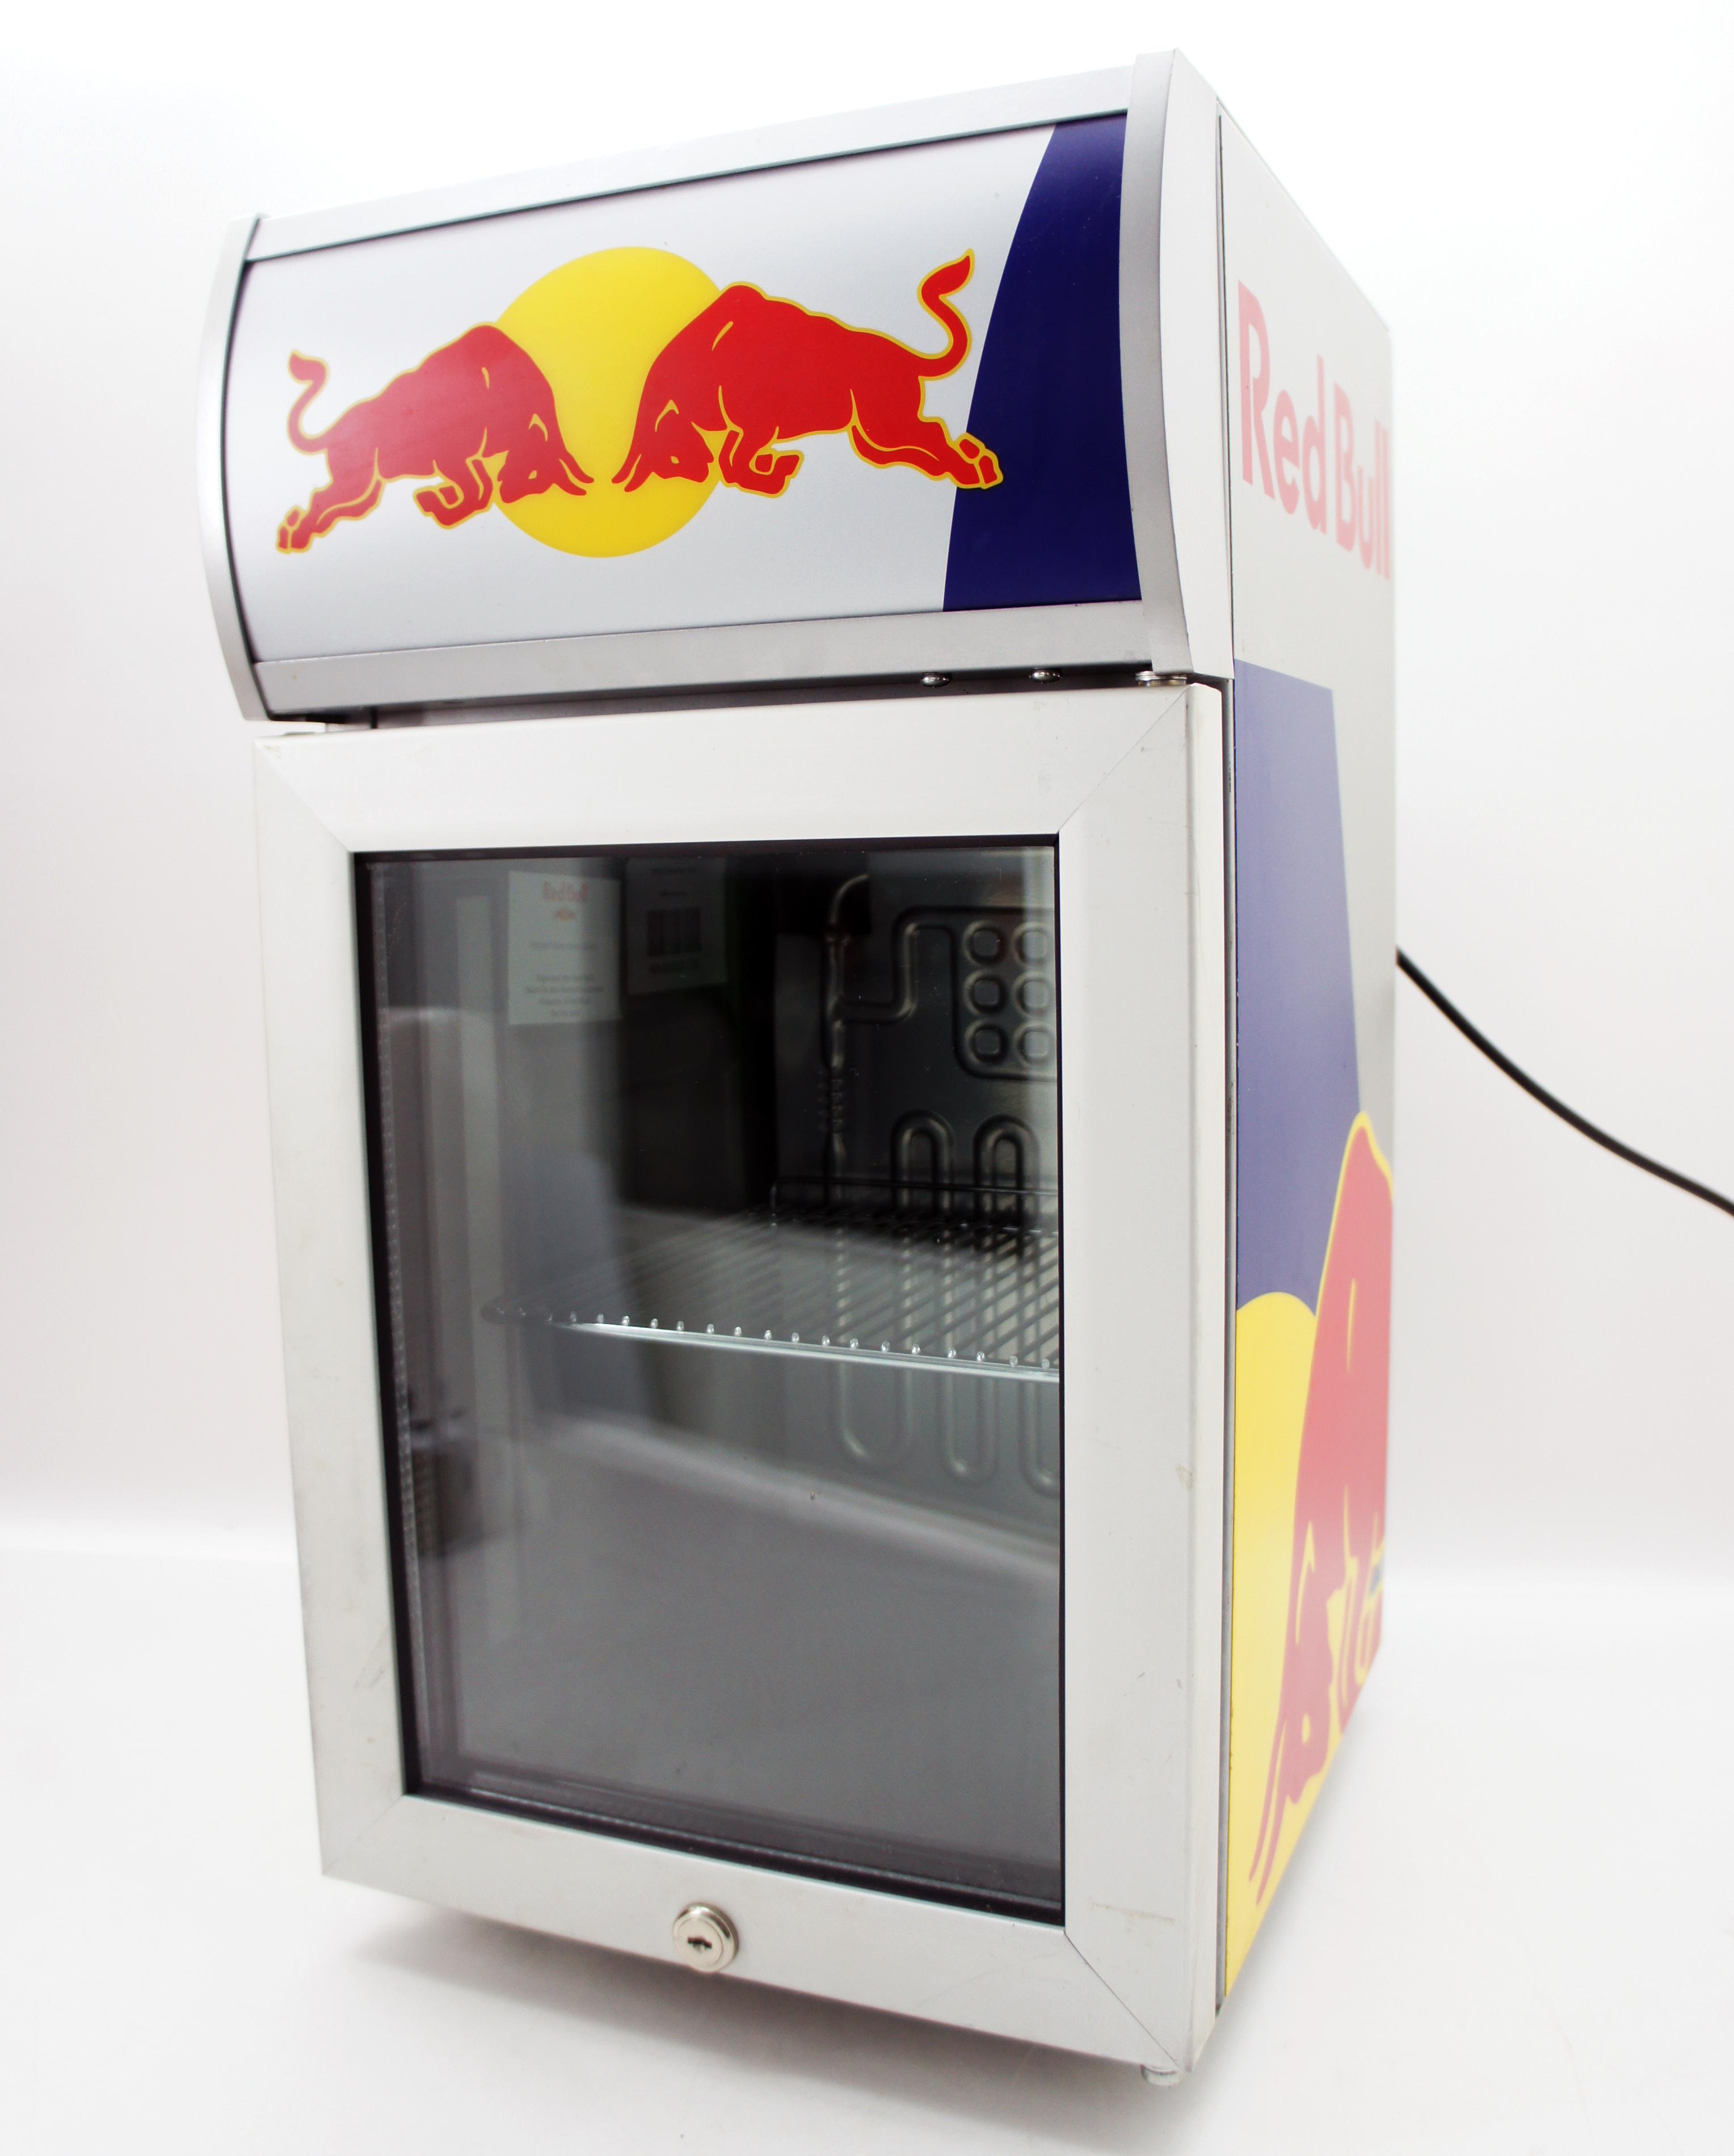 Original Red Bull Kühlschrank - Elsie Gomez Blog